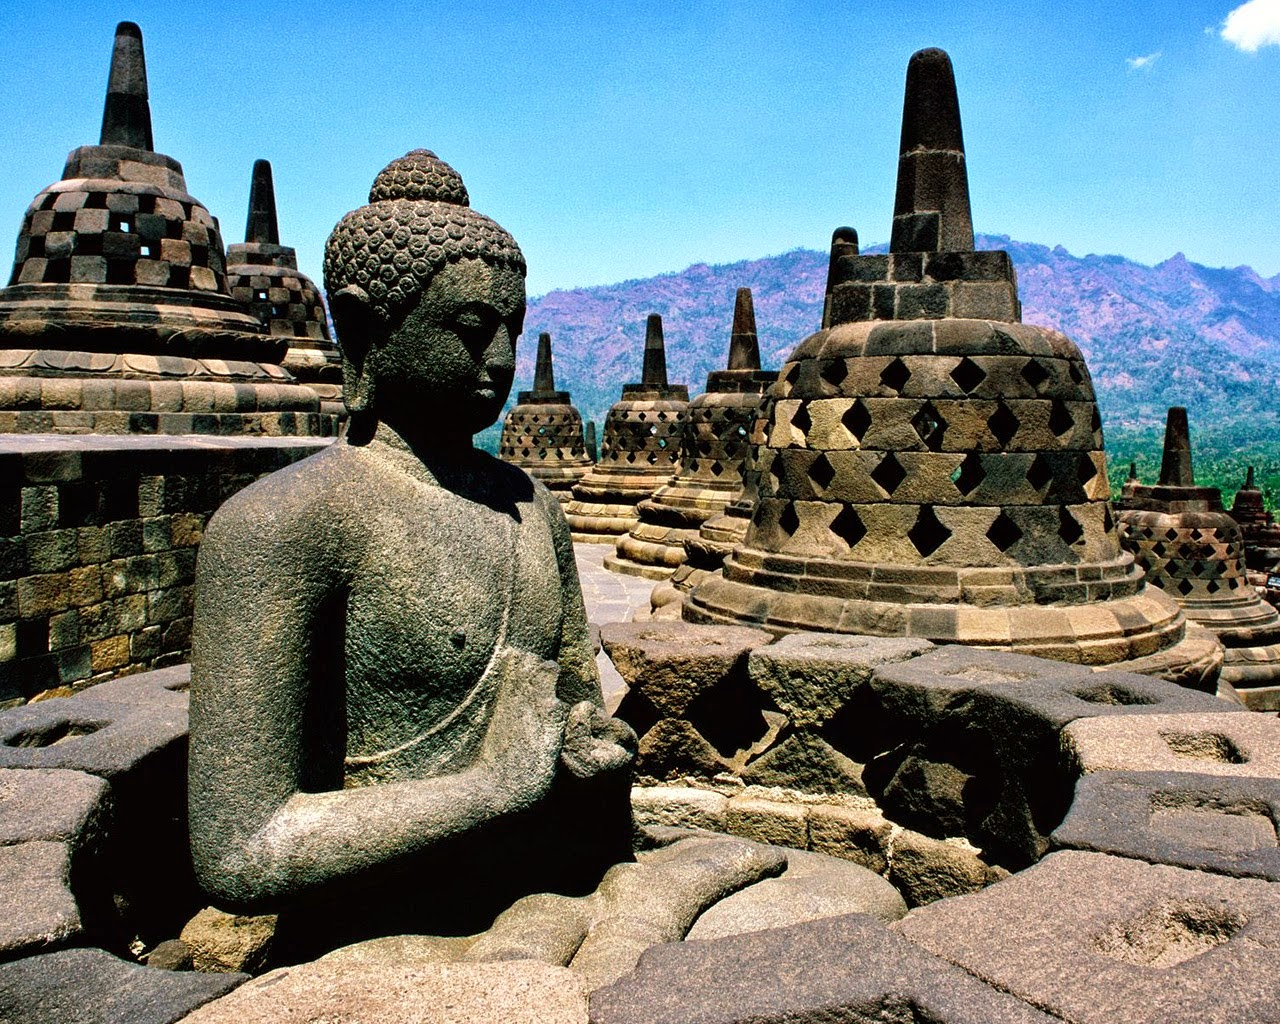 Welcome Dattebasa Akulturasi Kebudayaan Nusantara Hindu Buddha